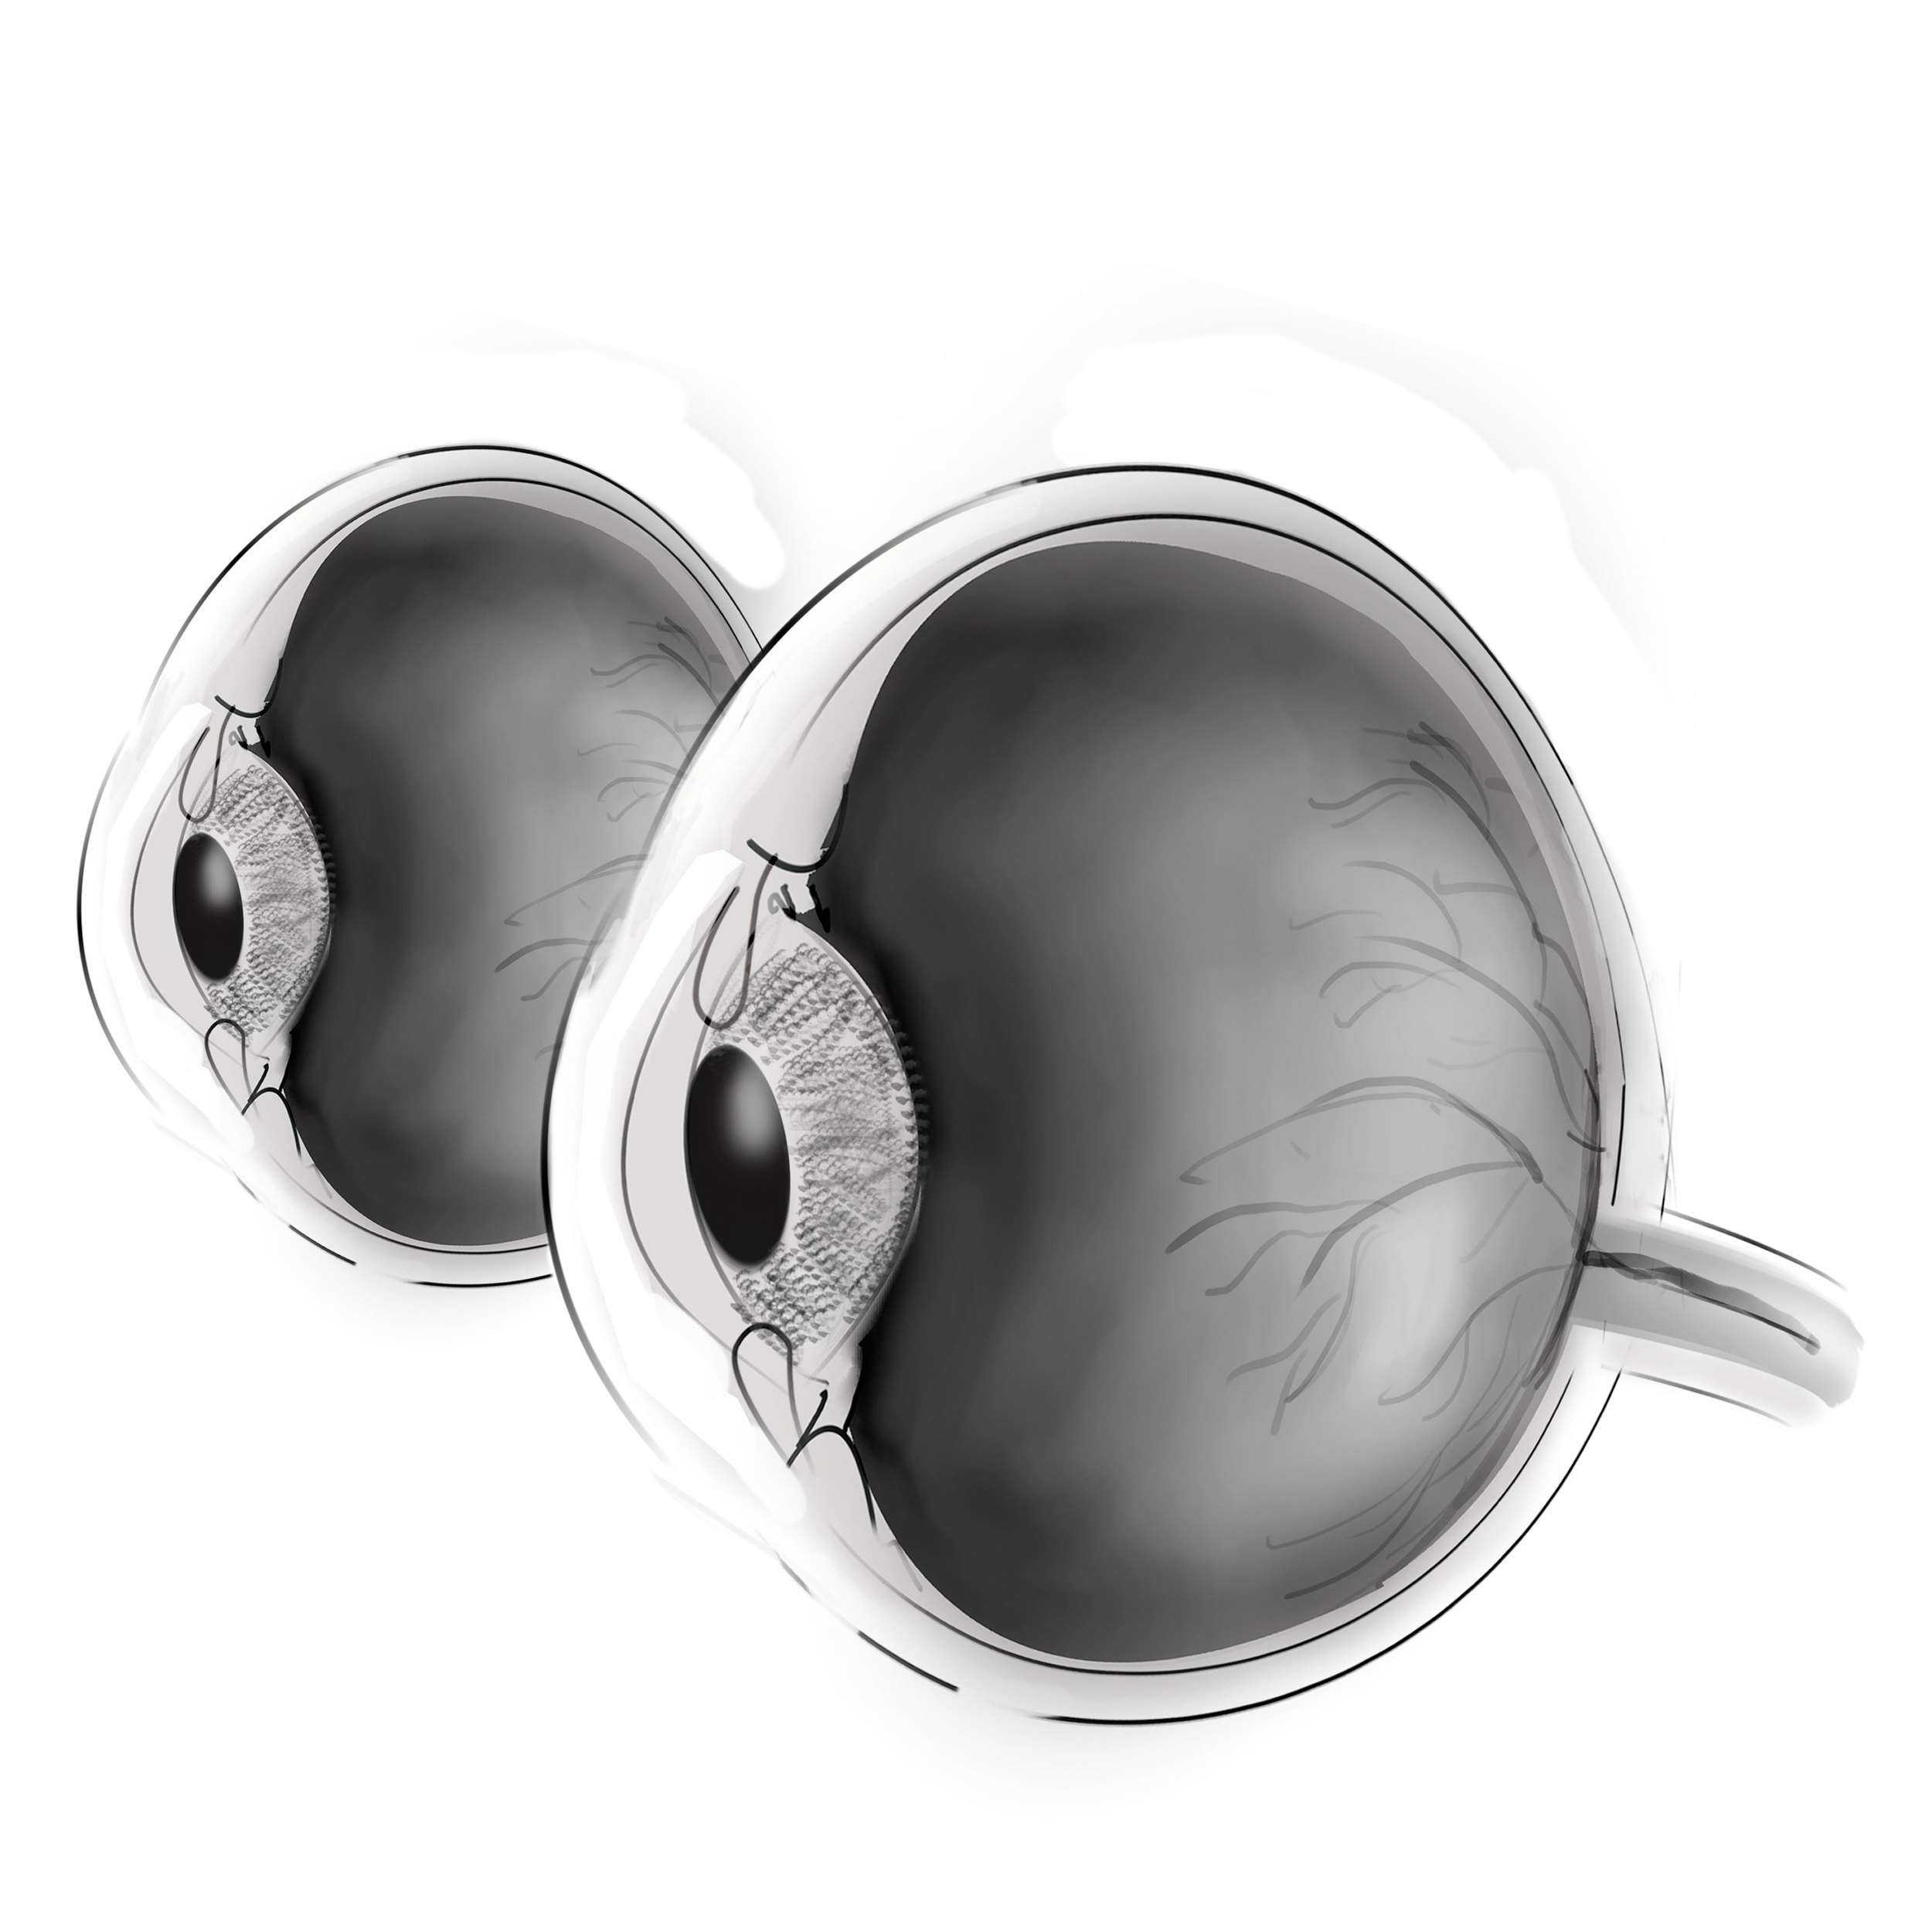 eye-three-qtr.jpg